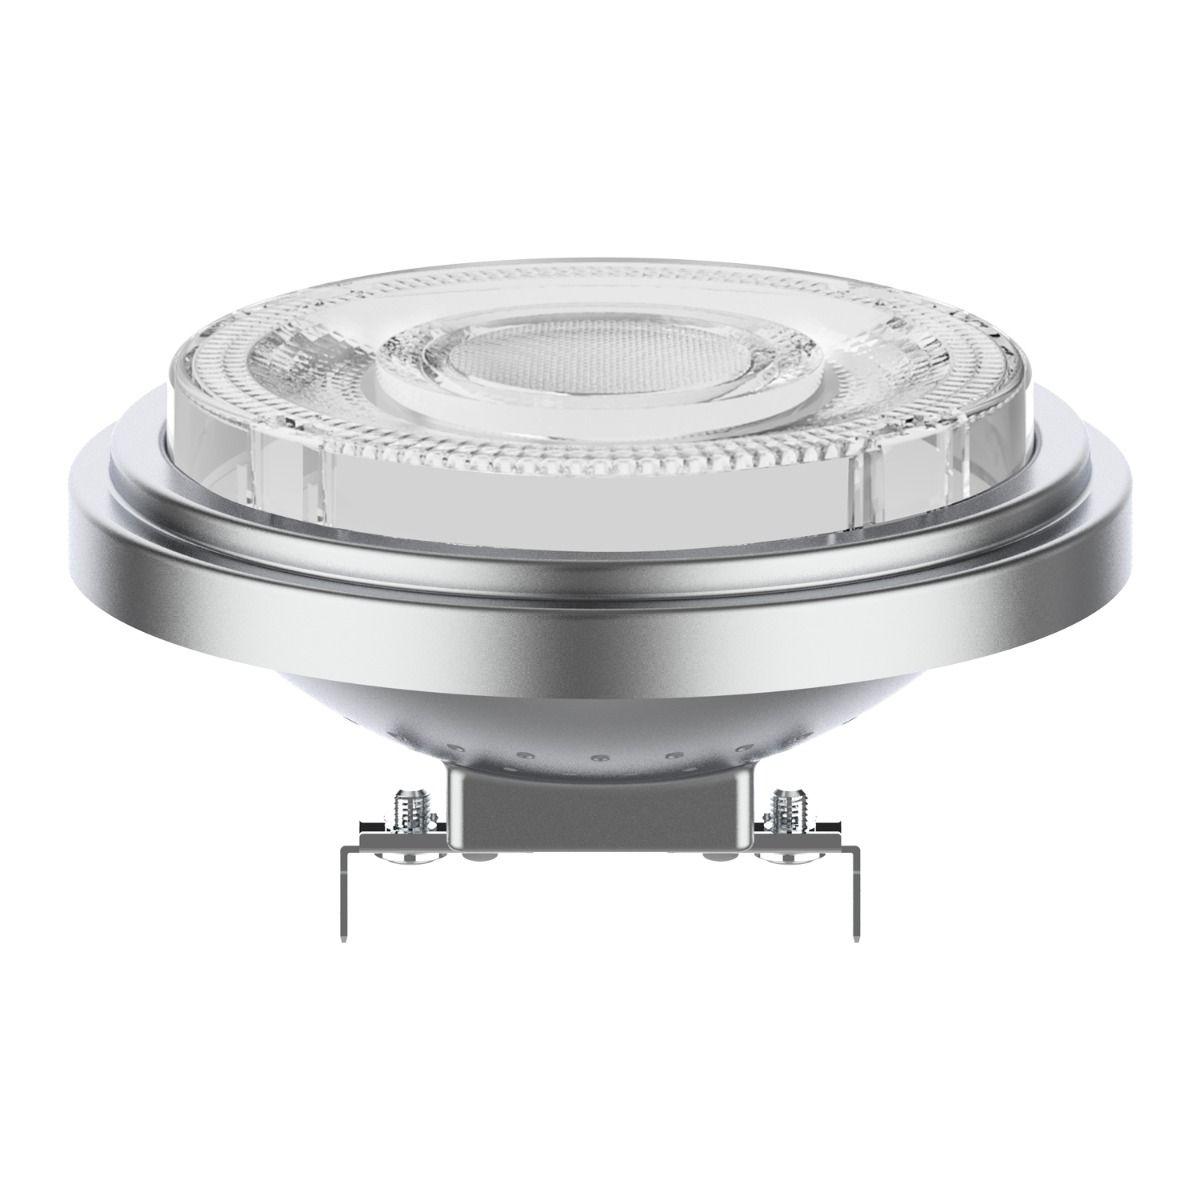 Noxion Lucent LED-Spot AR111 G53 12V 11.5W 930 24D | Dimmbar - Höchste Farbwiedergabe - Ersatz für 75W